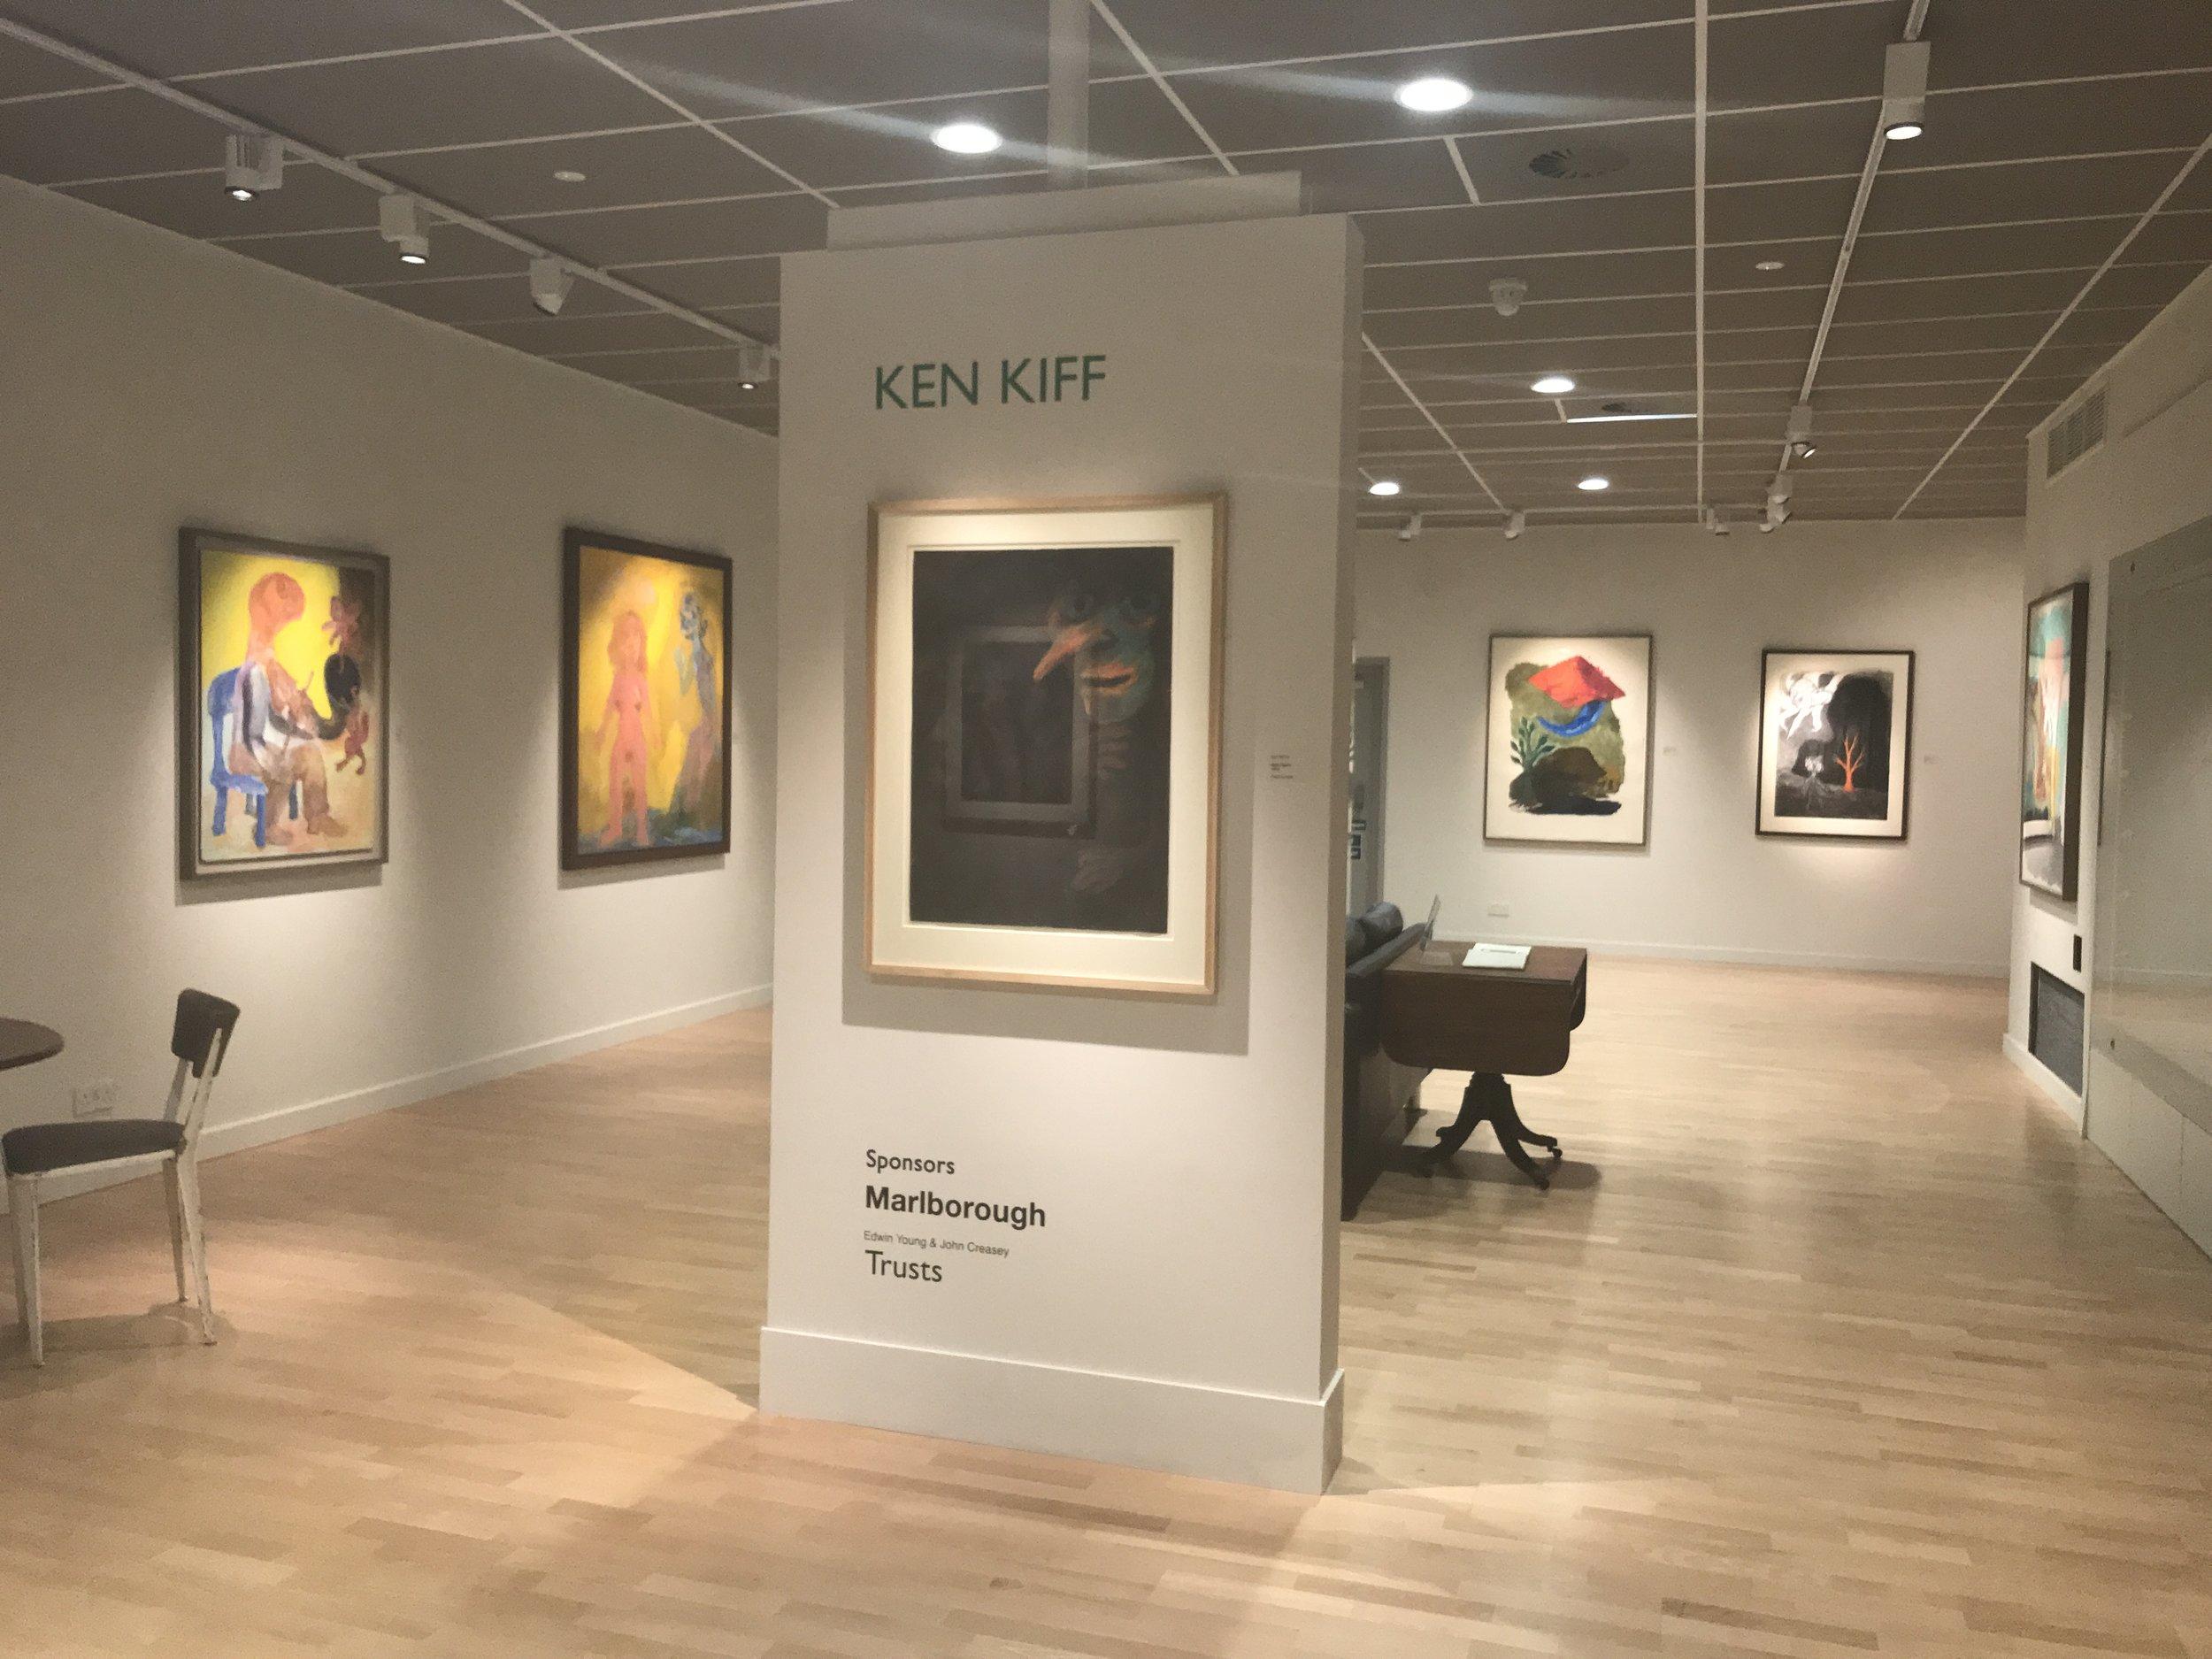 Ken Kiff at the Young Gallery, Salisbury, 2018